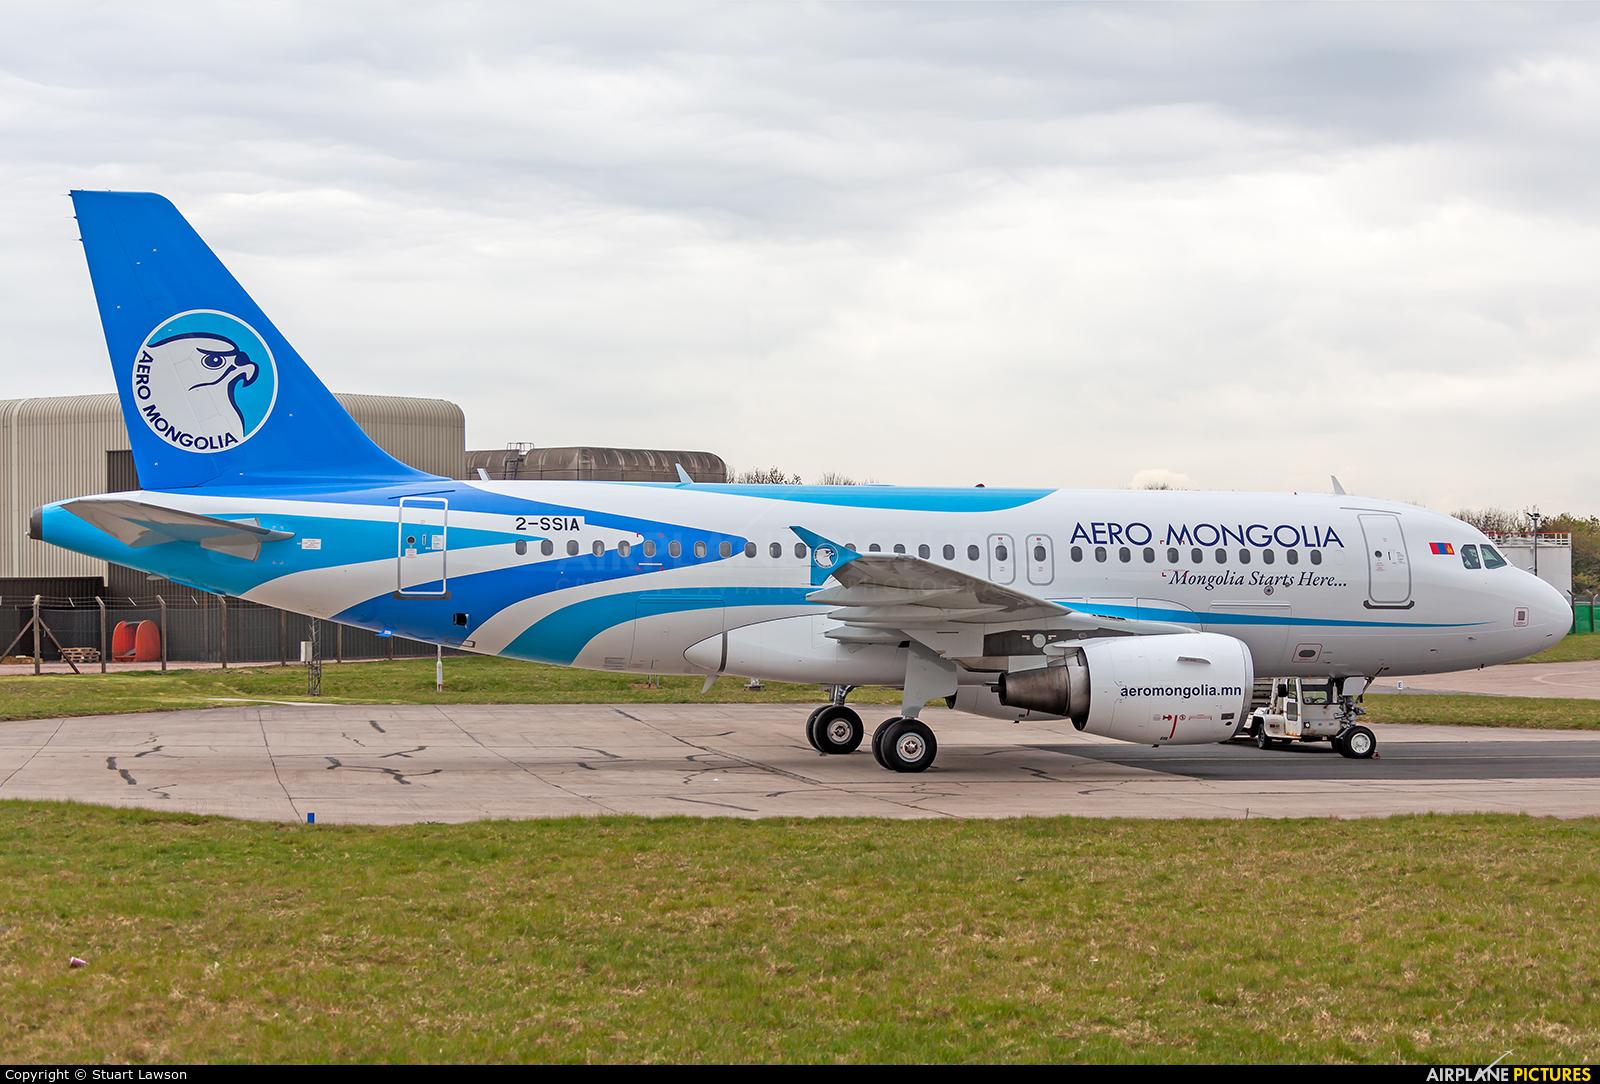 Aero Mongolia 2-SSIA aircraft at East Midlands